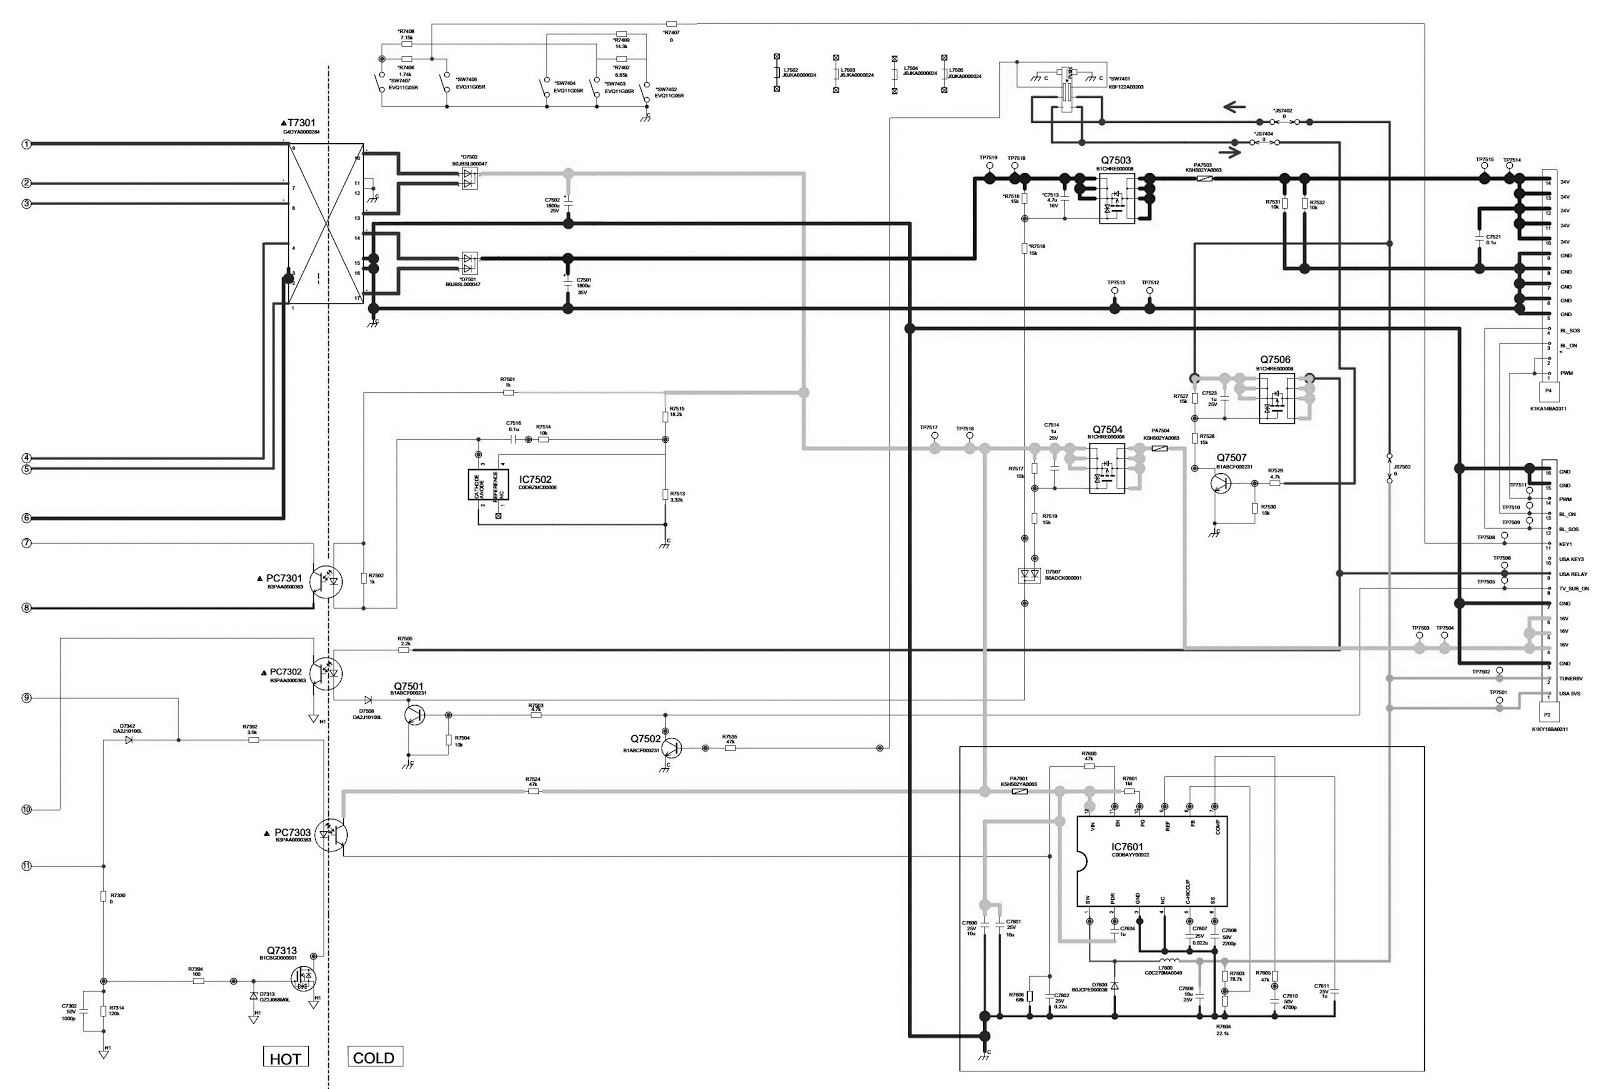 TNPA5364BJ  SMPS SCHEMATIC     PANASONIC       TH    L32X30C  LCD TV   Electro help